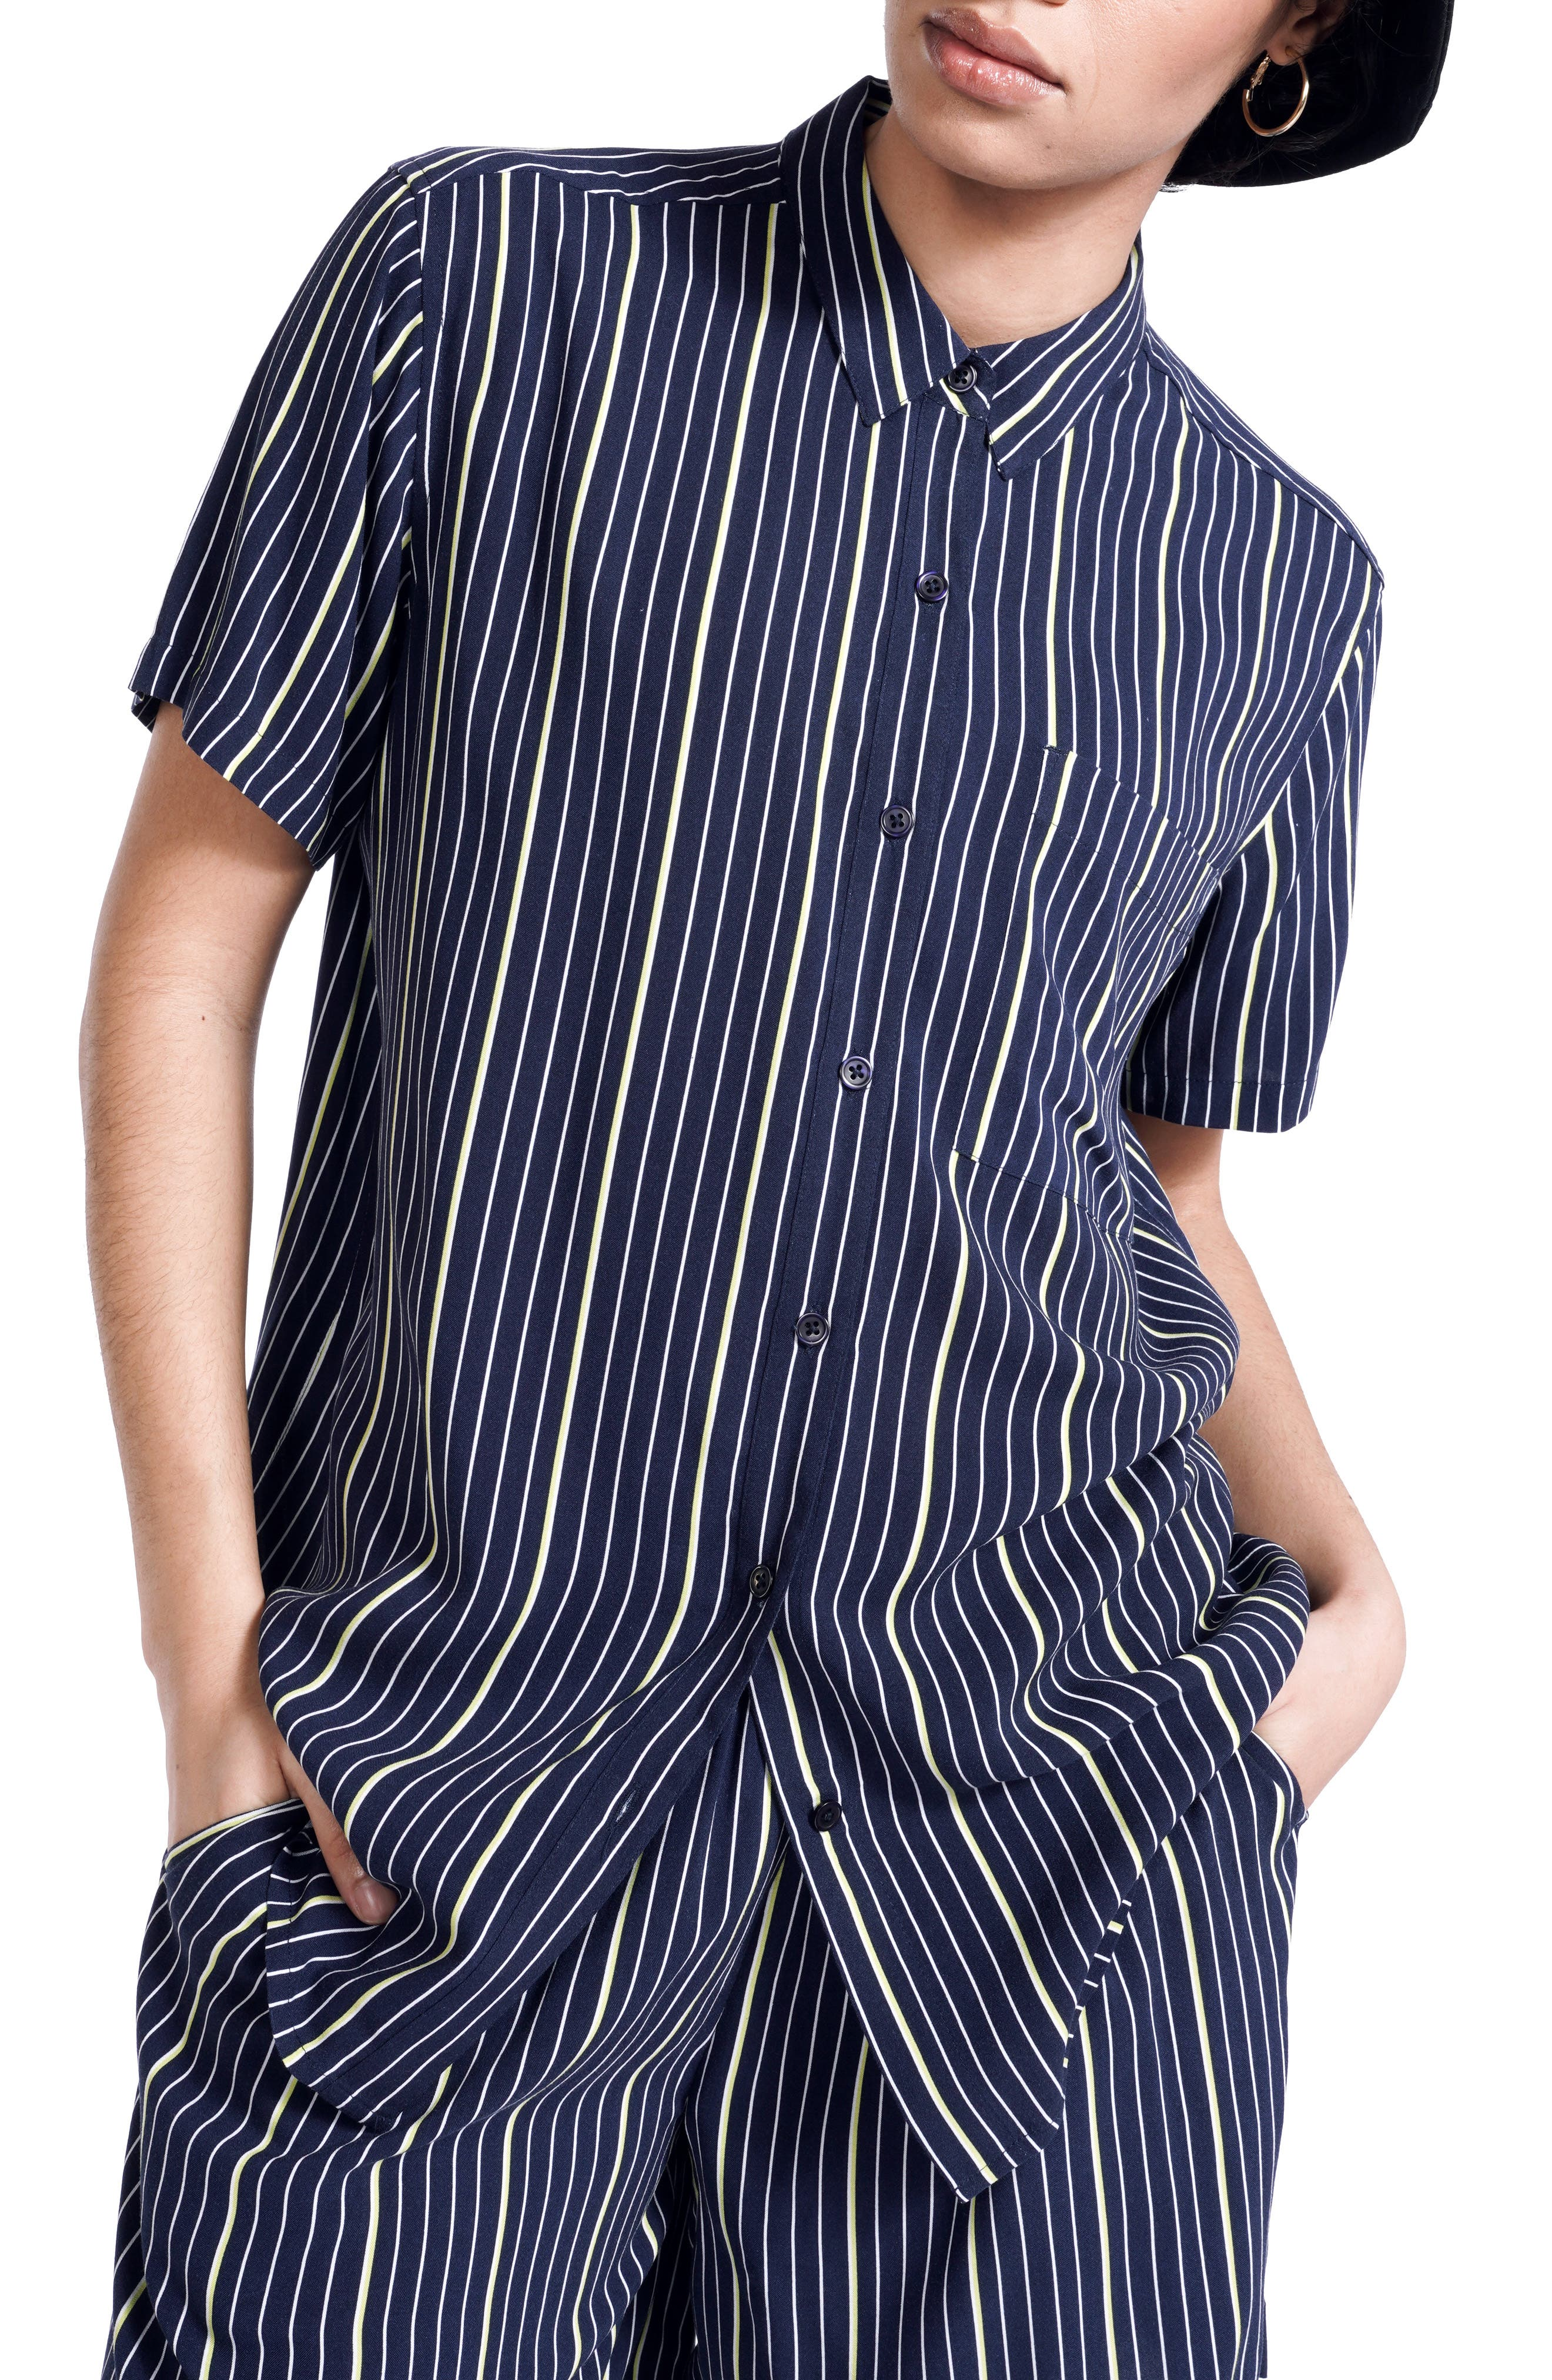 Women's Bp. + Wildfang Relaxed Short Sleeve Button-Down Shirt